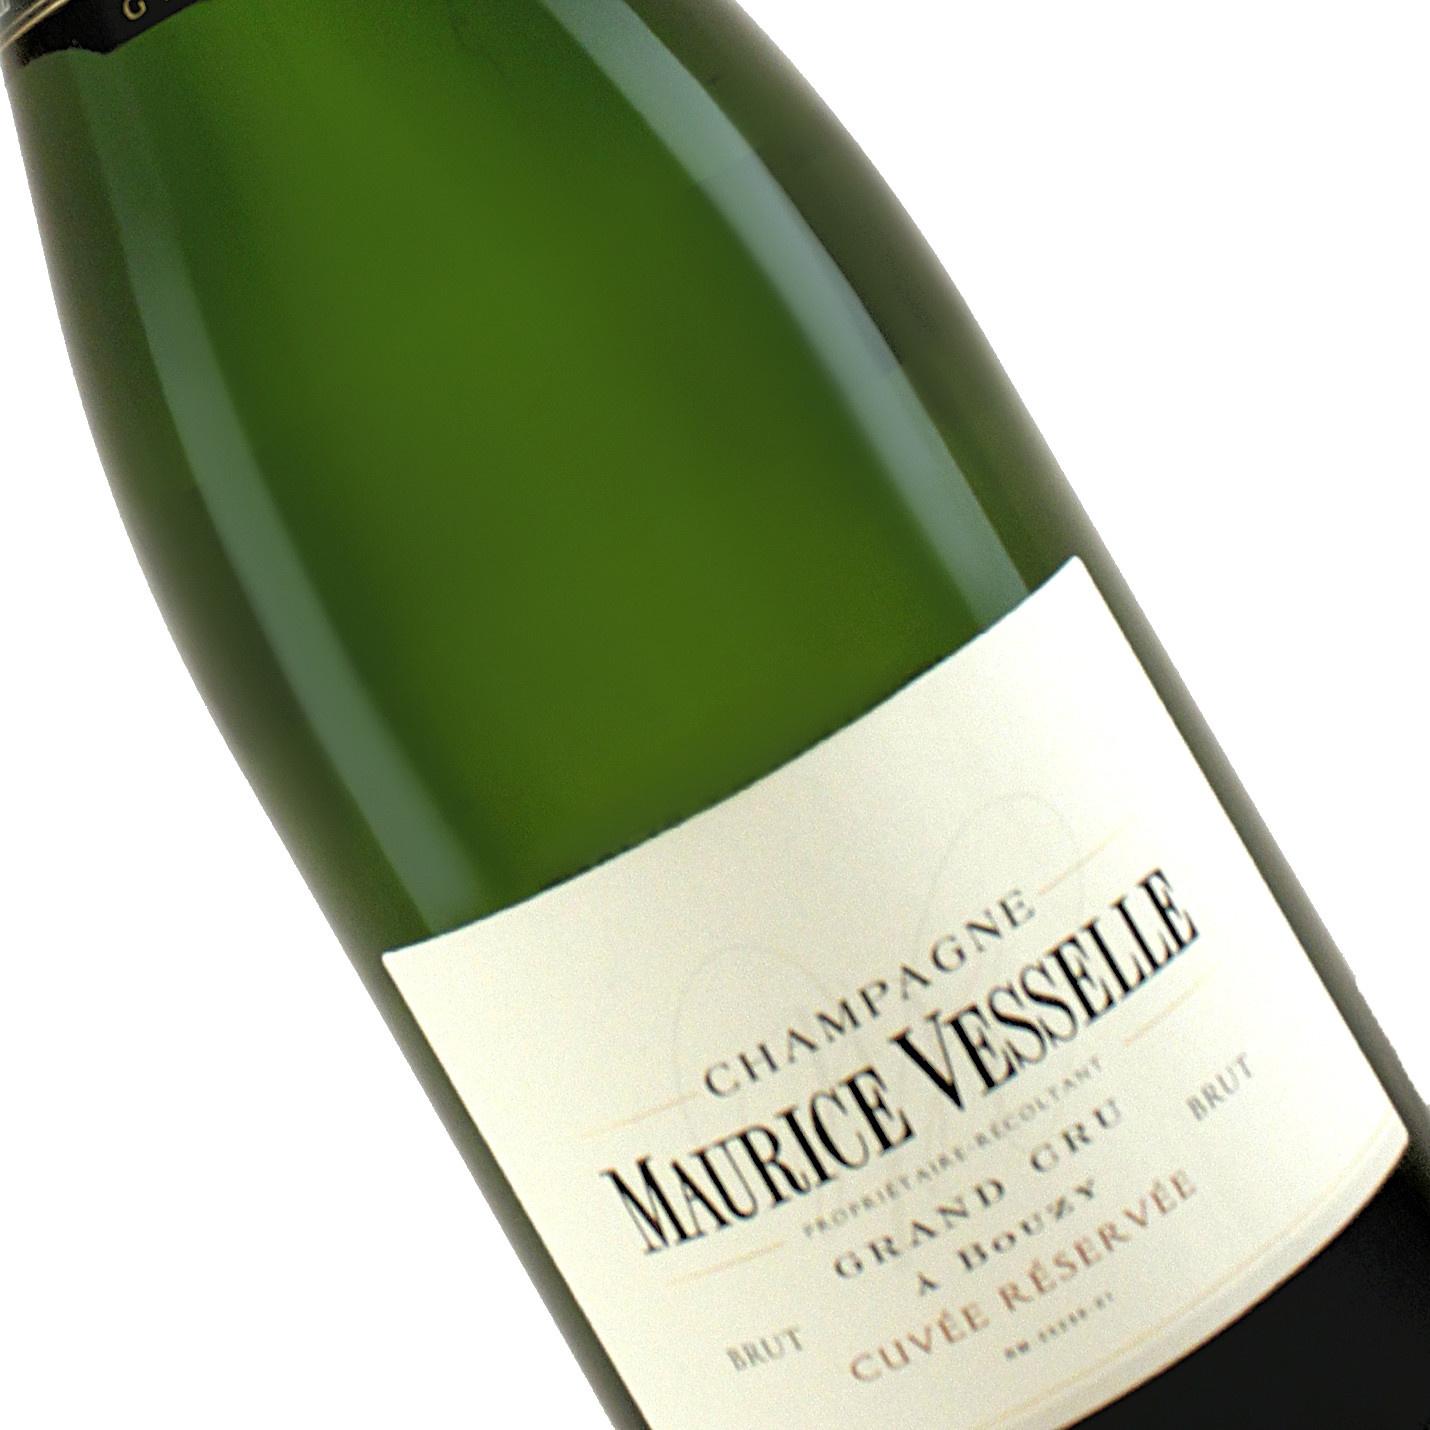 Maurice Vesselle N.V. Brut Cuvee Reserve Champagne Grand Cru, Bouzy